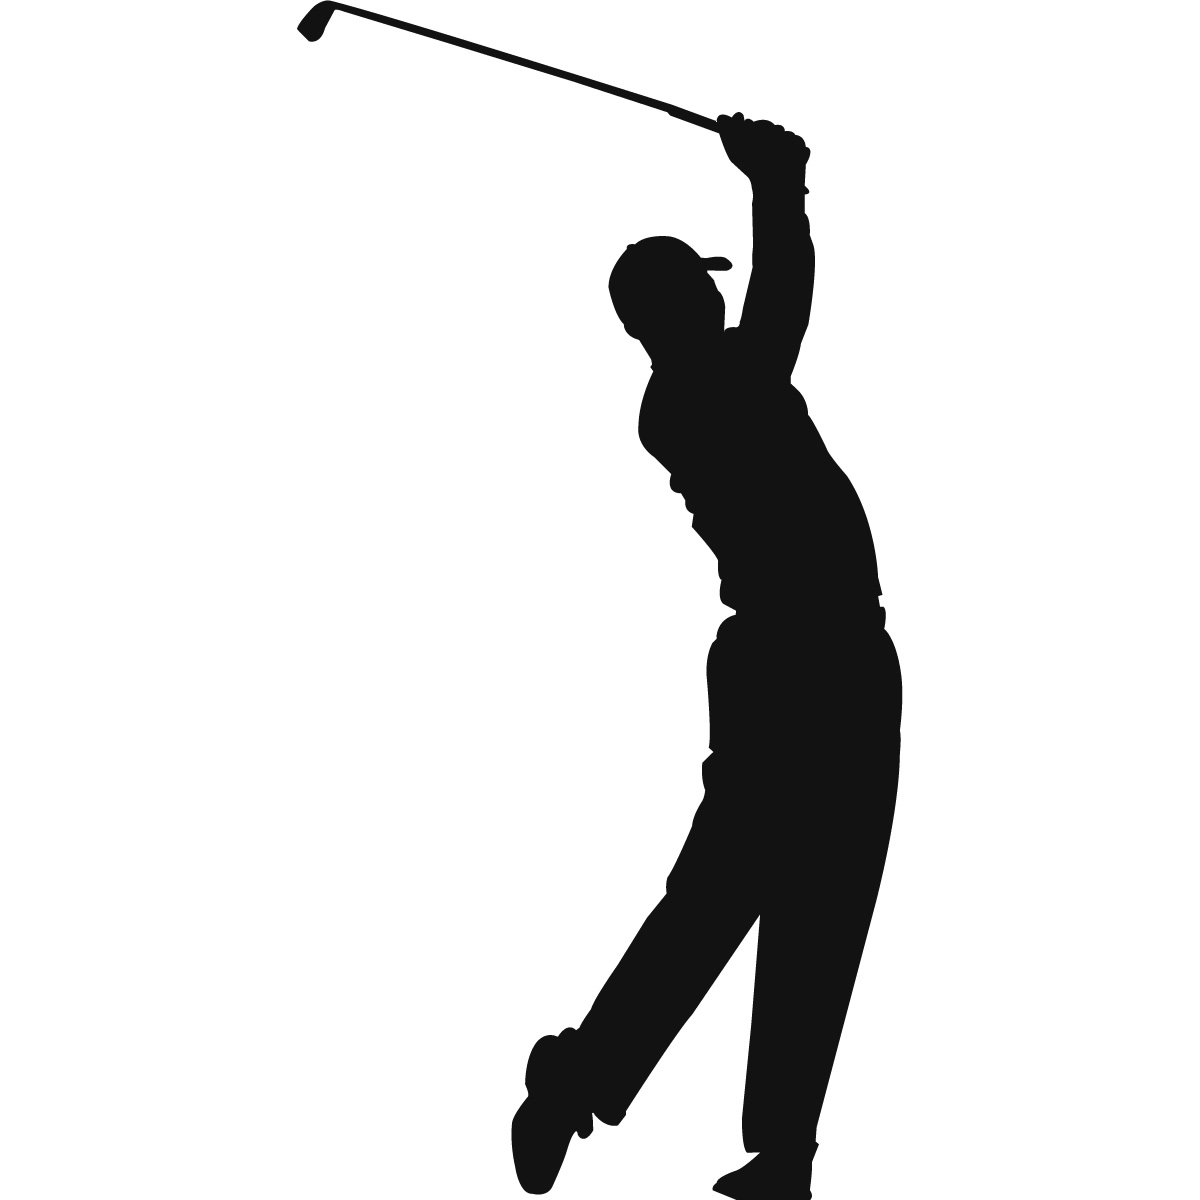 Free Golfer Cliparts, Download Free Clip Art, Free Clip Art.